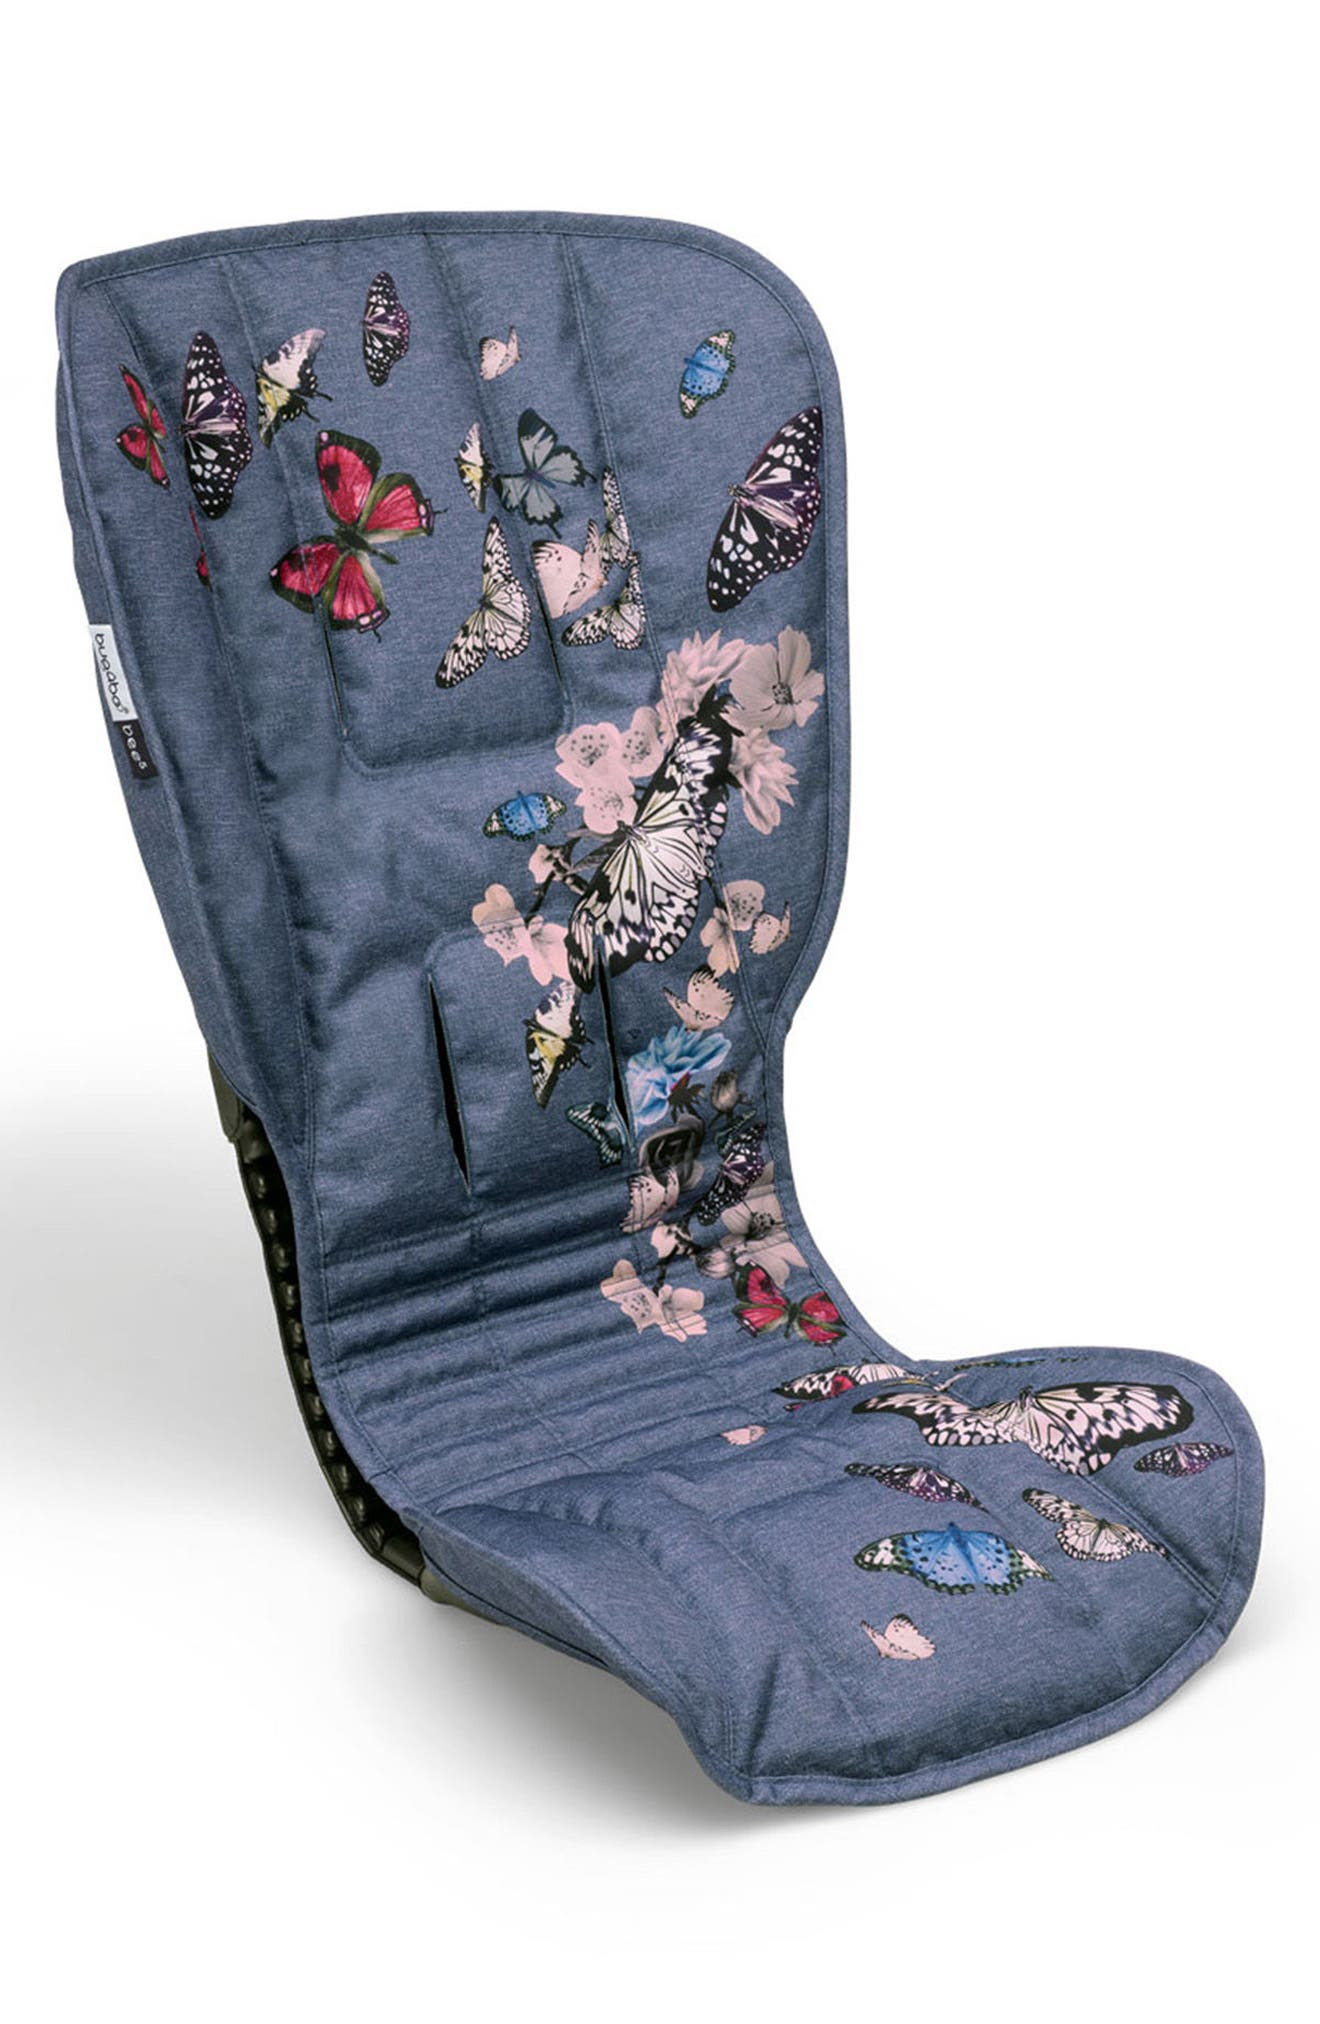 Main Image - Bugaboo Bee5 Stroller Seat Fabric